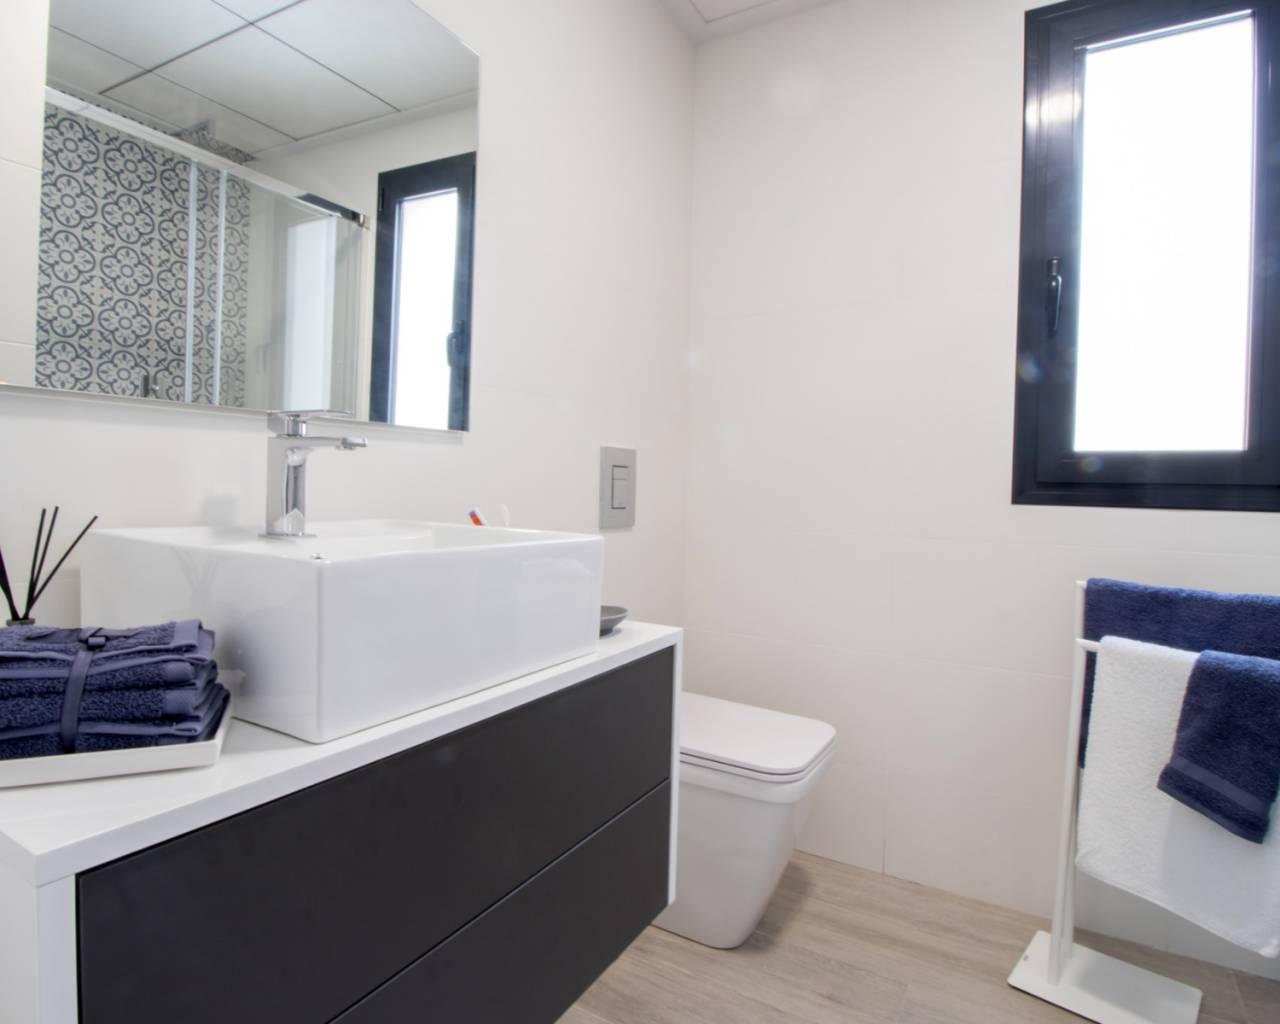 nieuwbouw-appartement-san-miguel-de-salinas_1794_xl